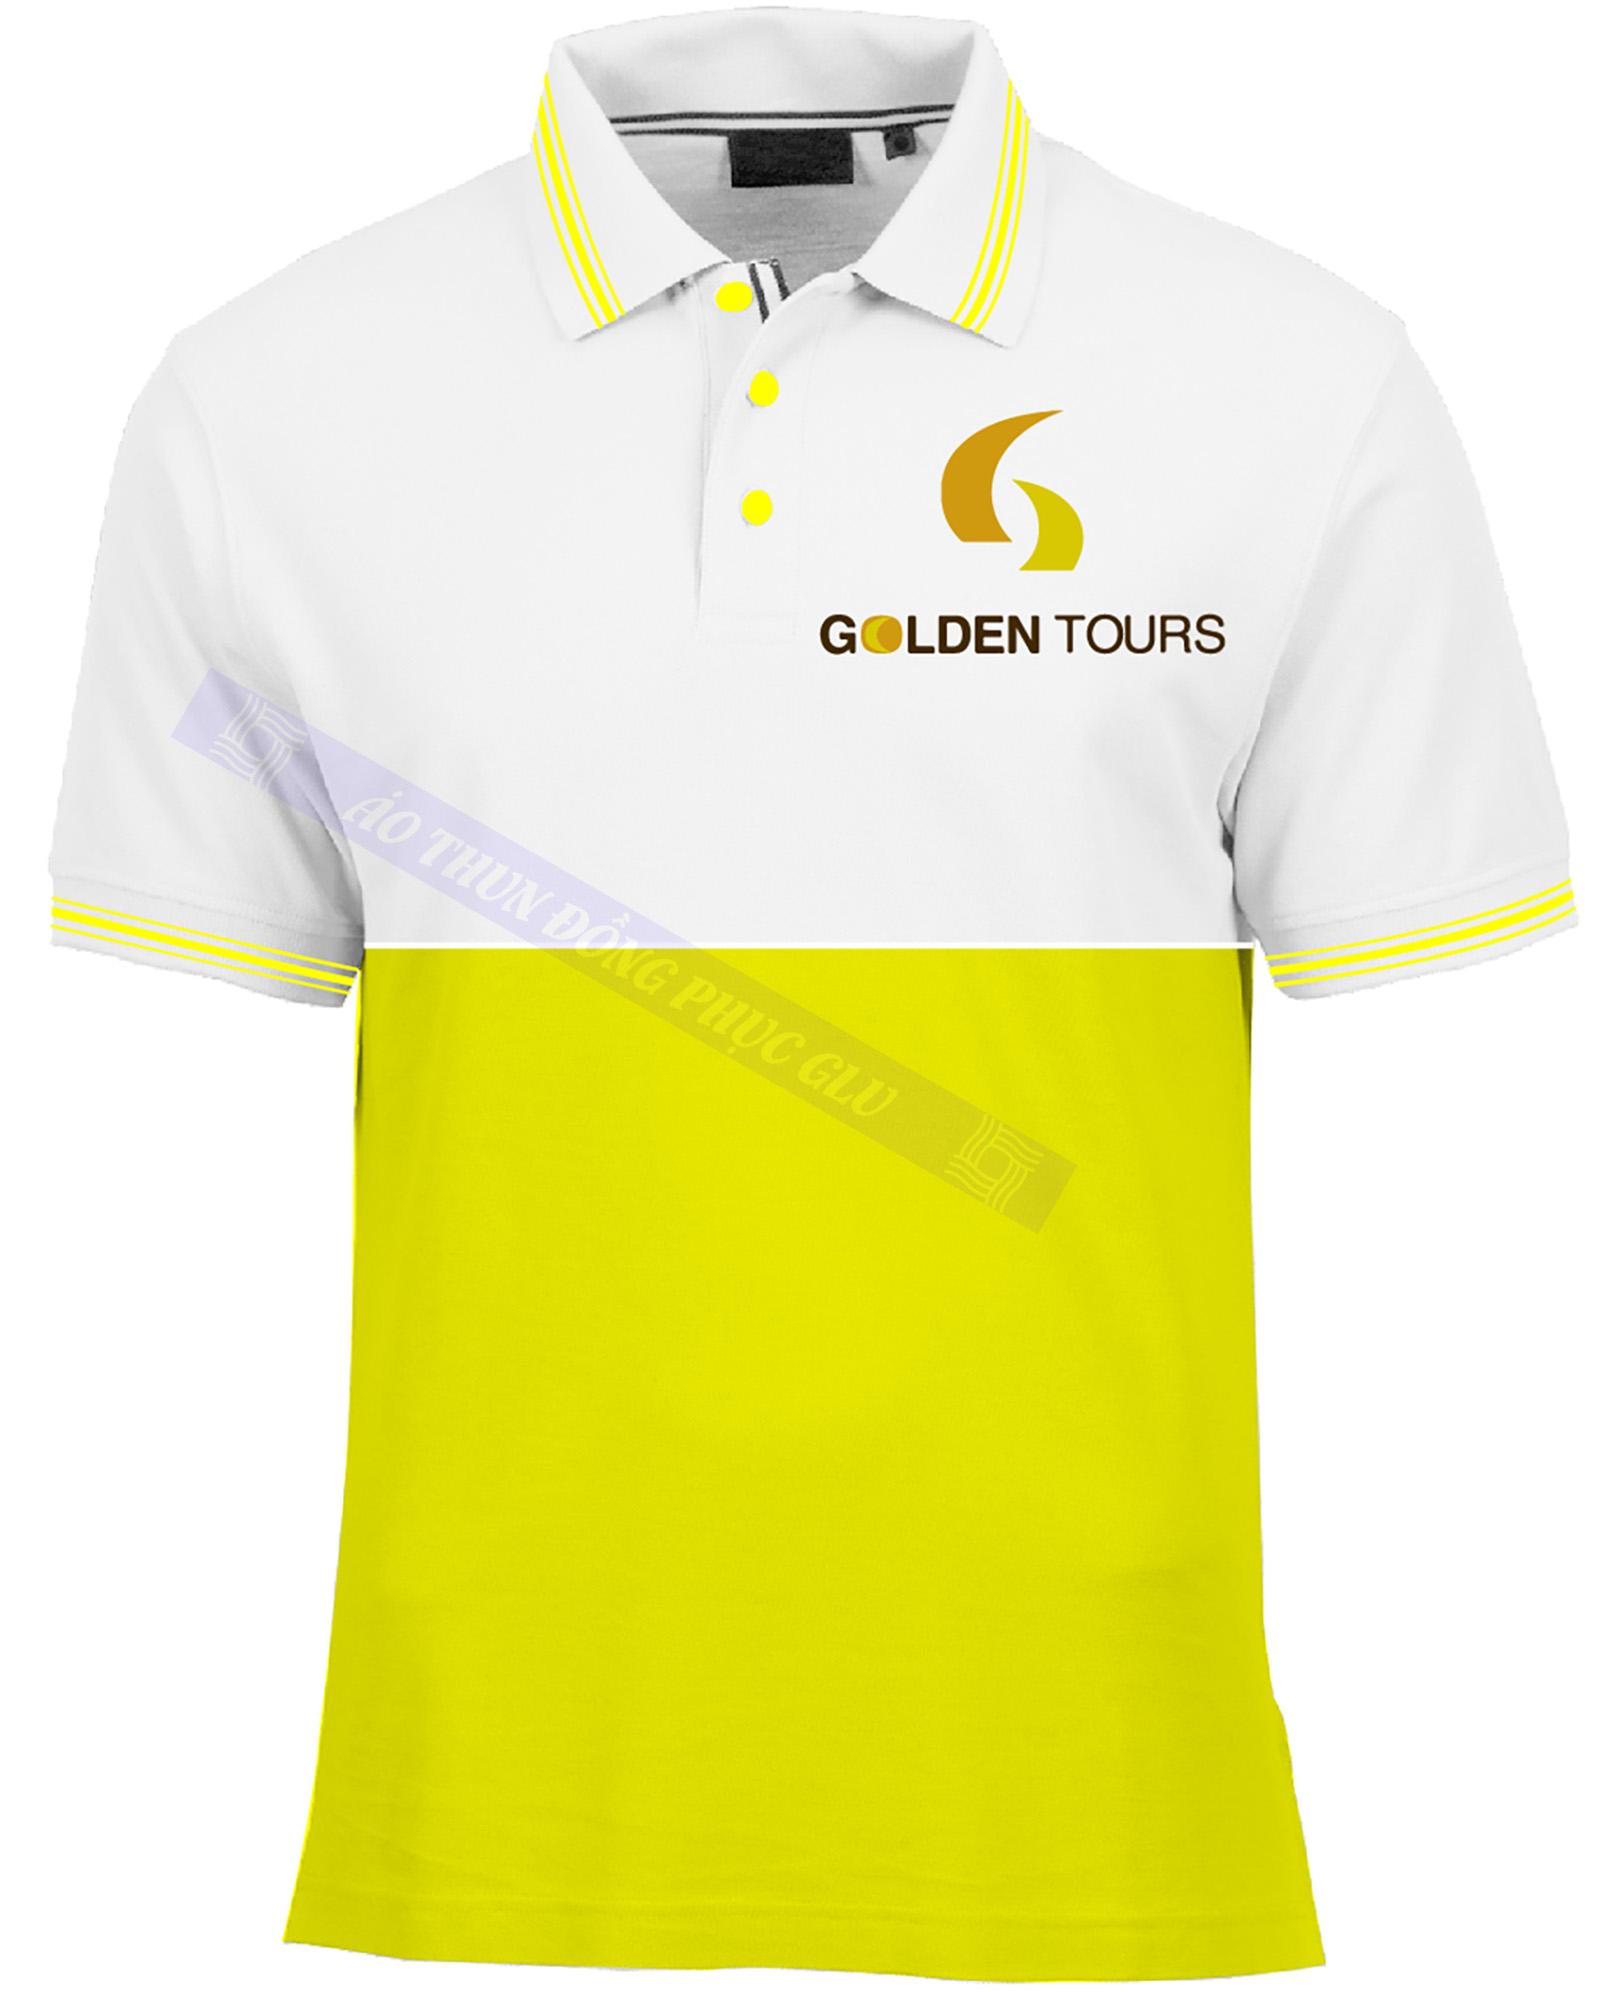 AO THUN GOLDEN TOUR AT372 áo thun đồng phục đẹp